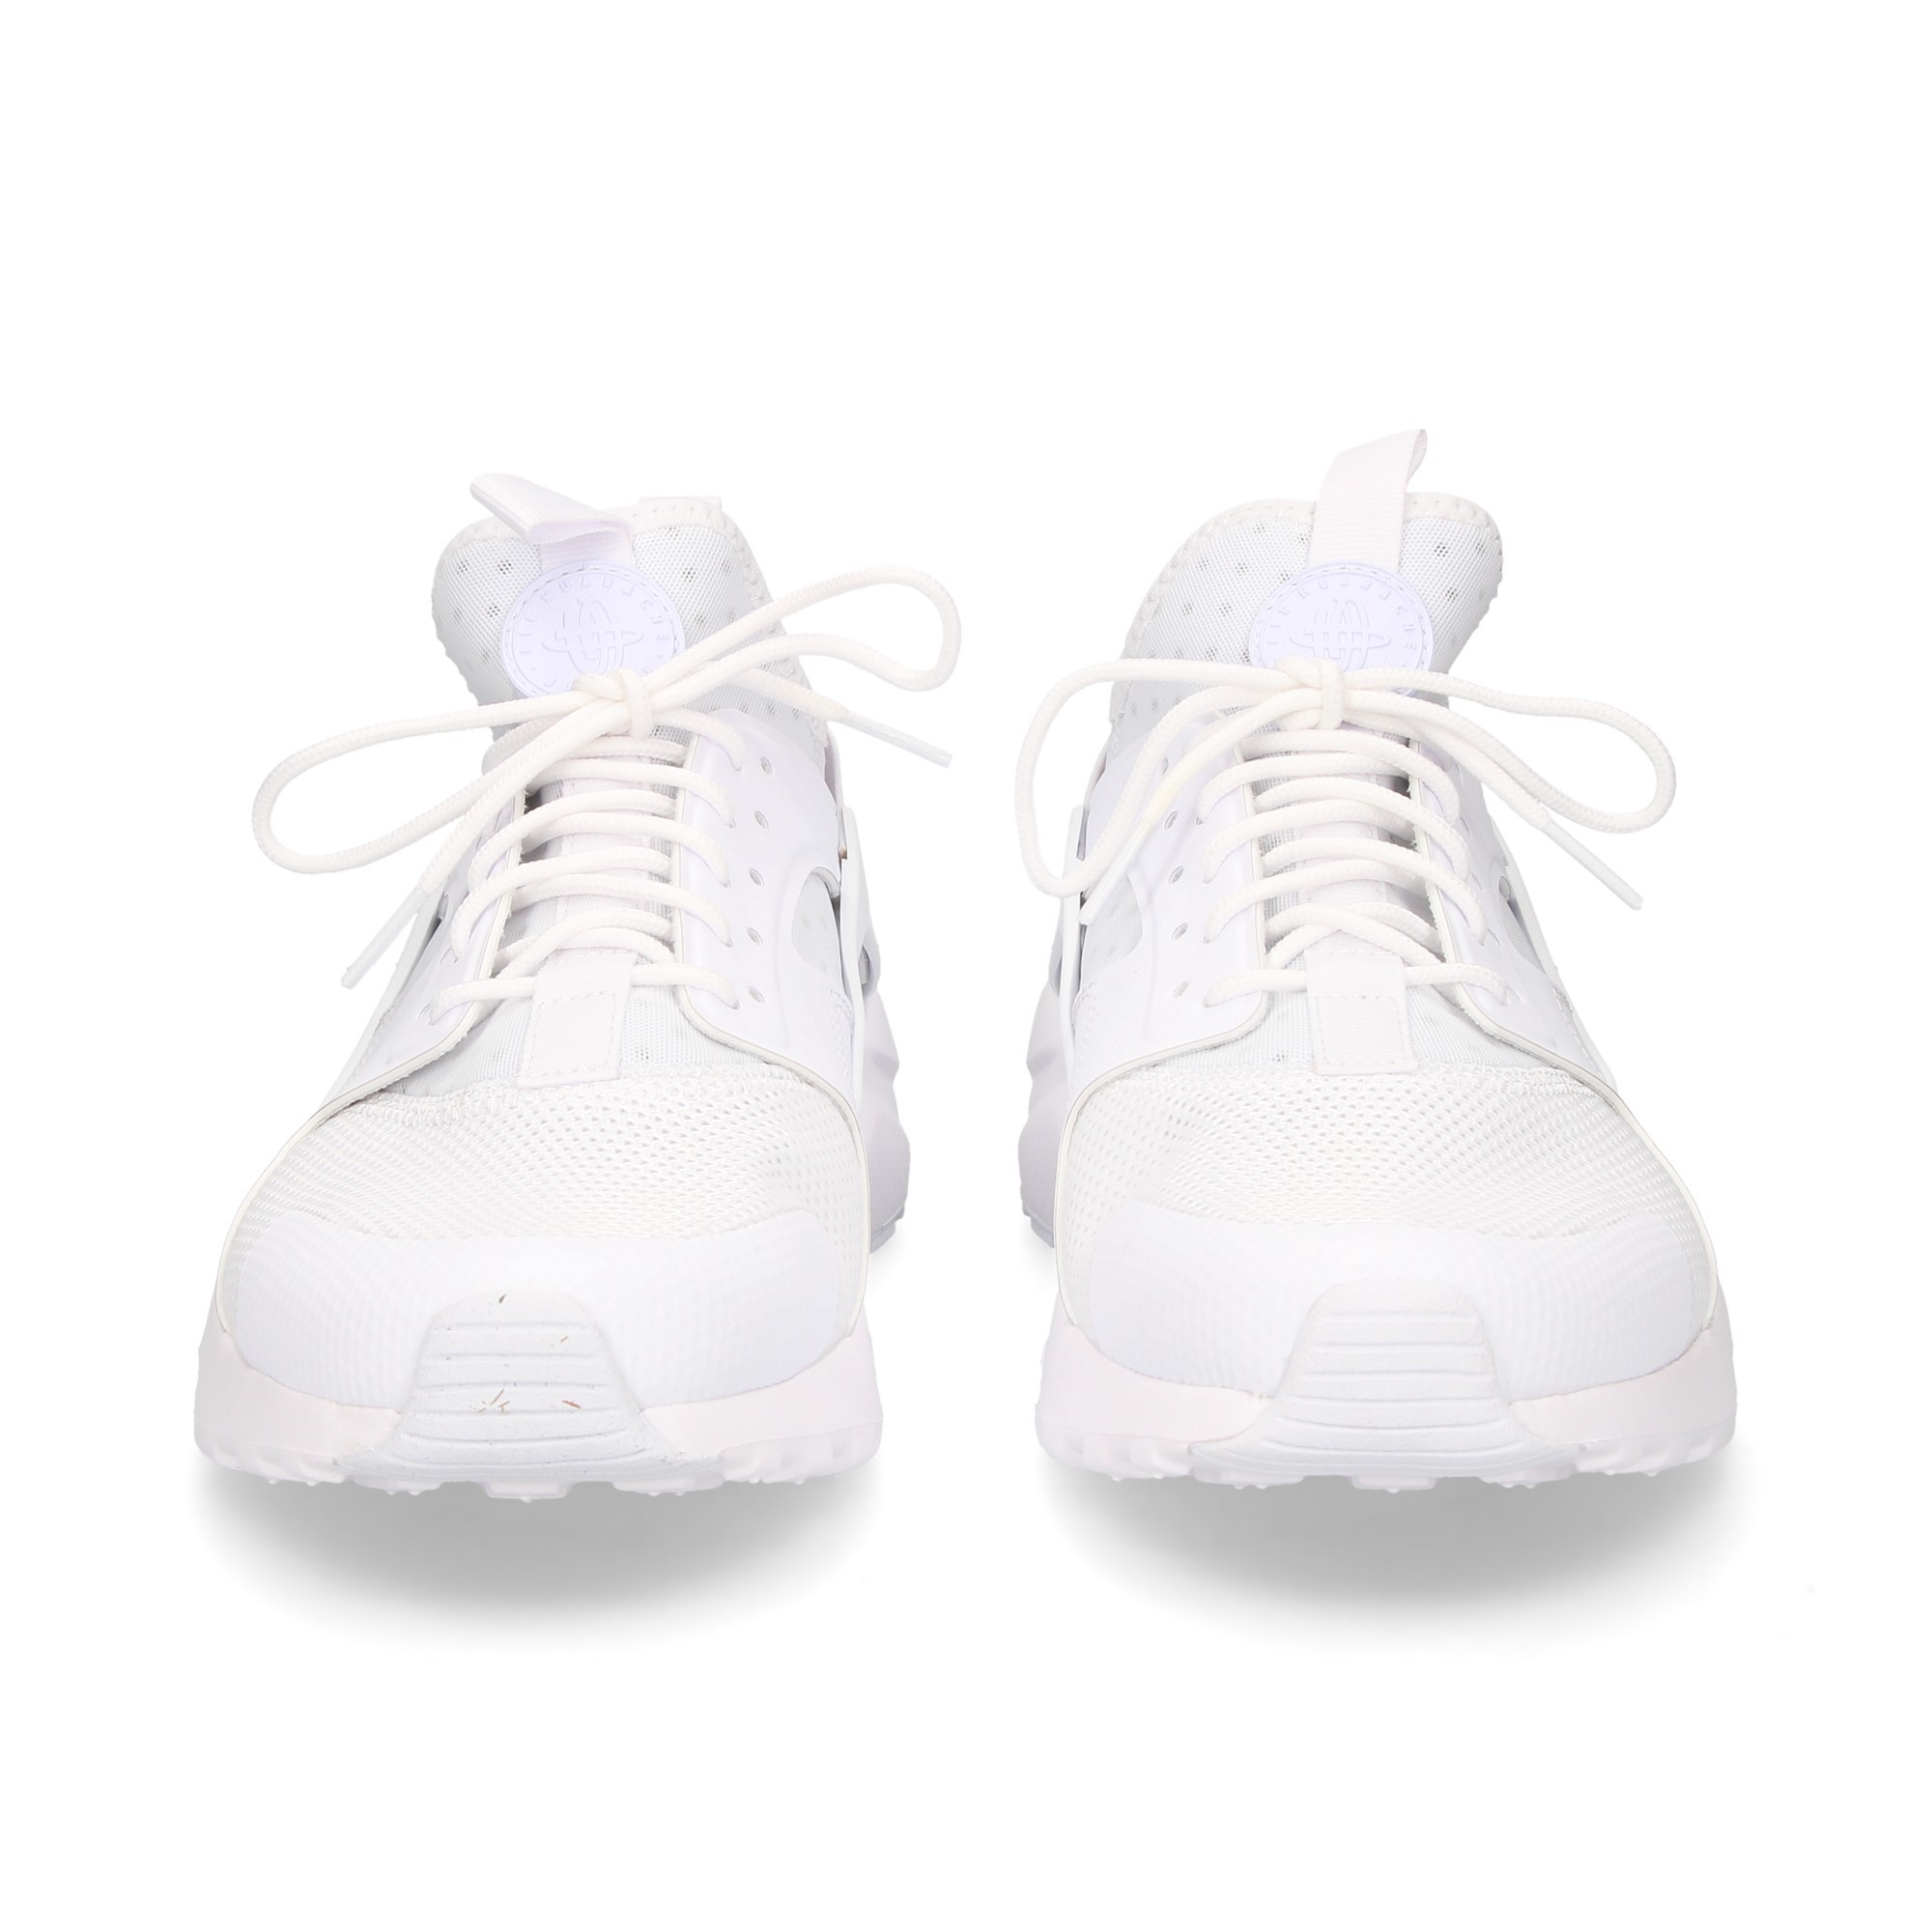 huarache-textil-nobuck-blanco